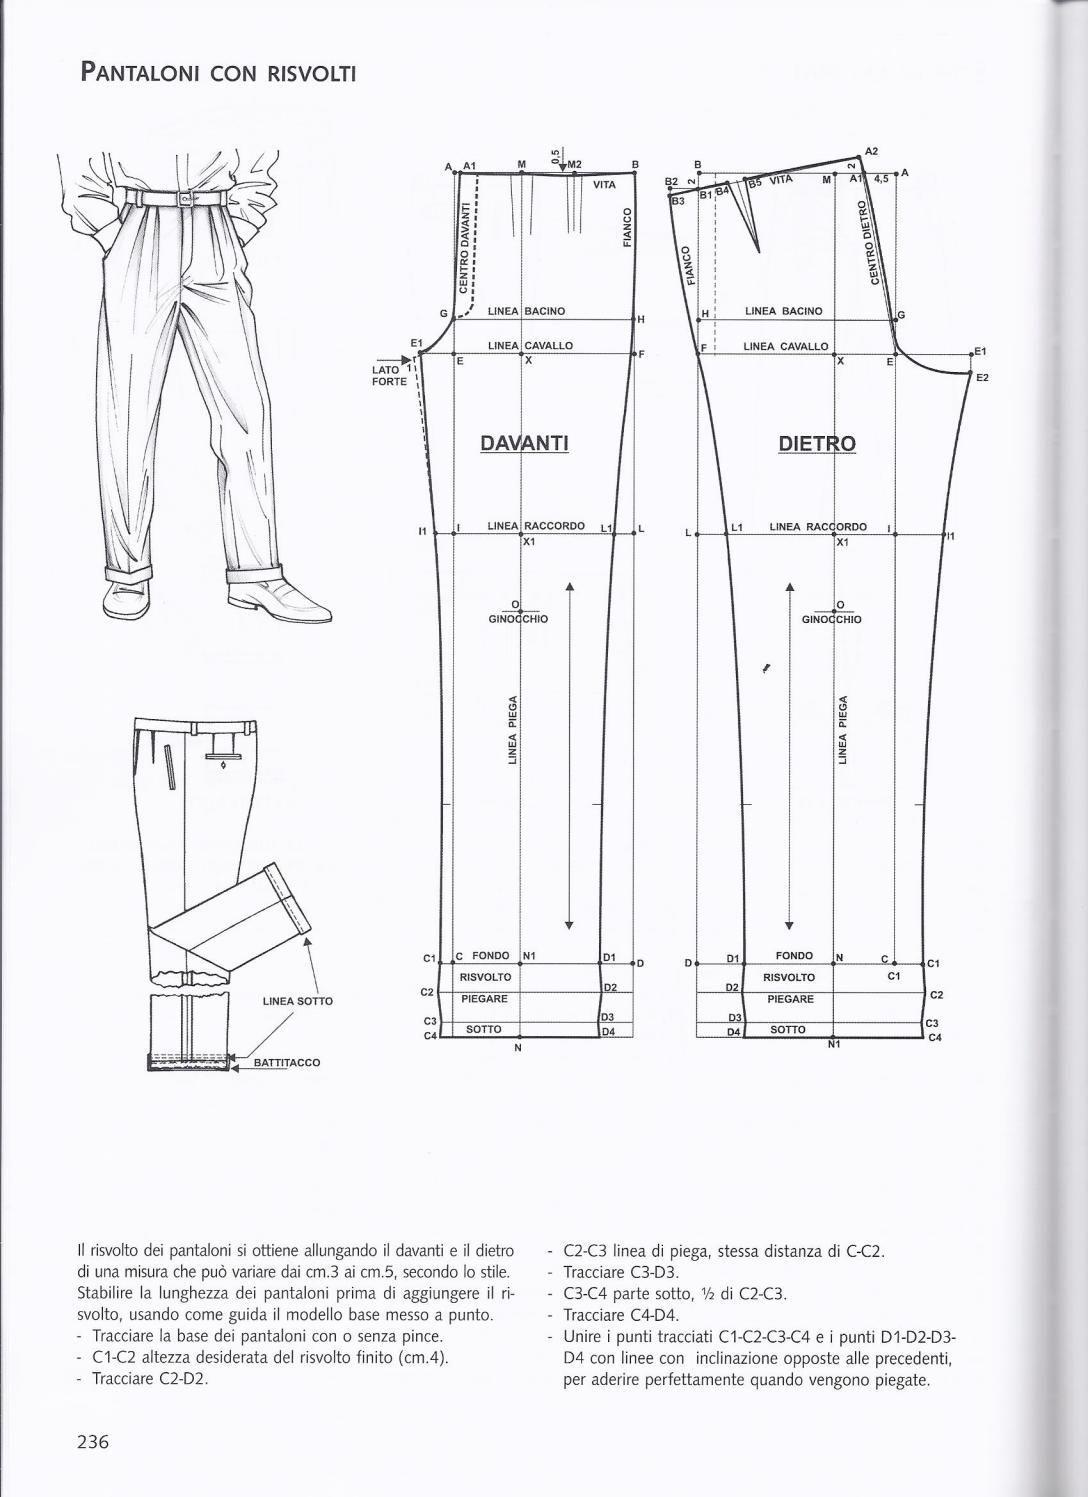 La tecnica dei modelli uomo donna 1 | Patronaje | Pinterest ...